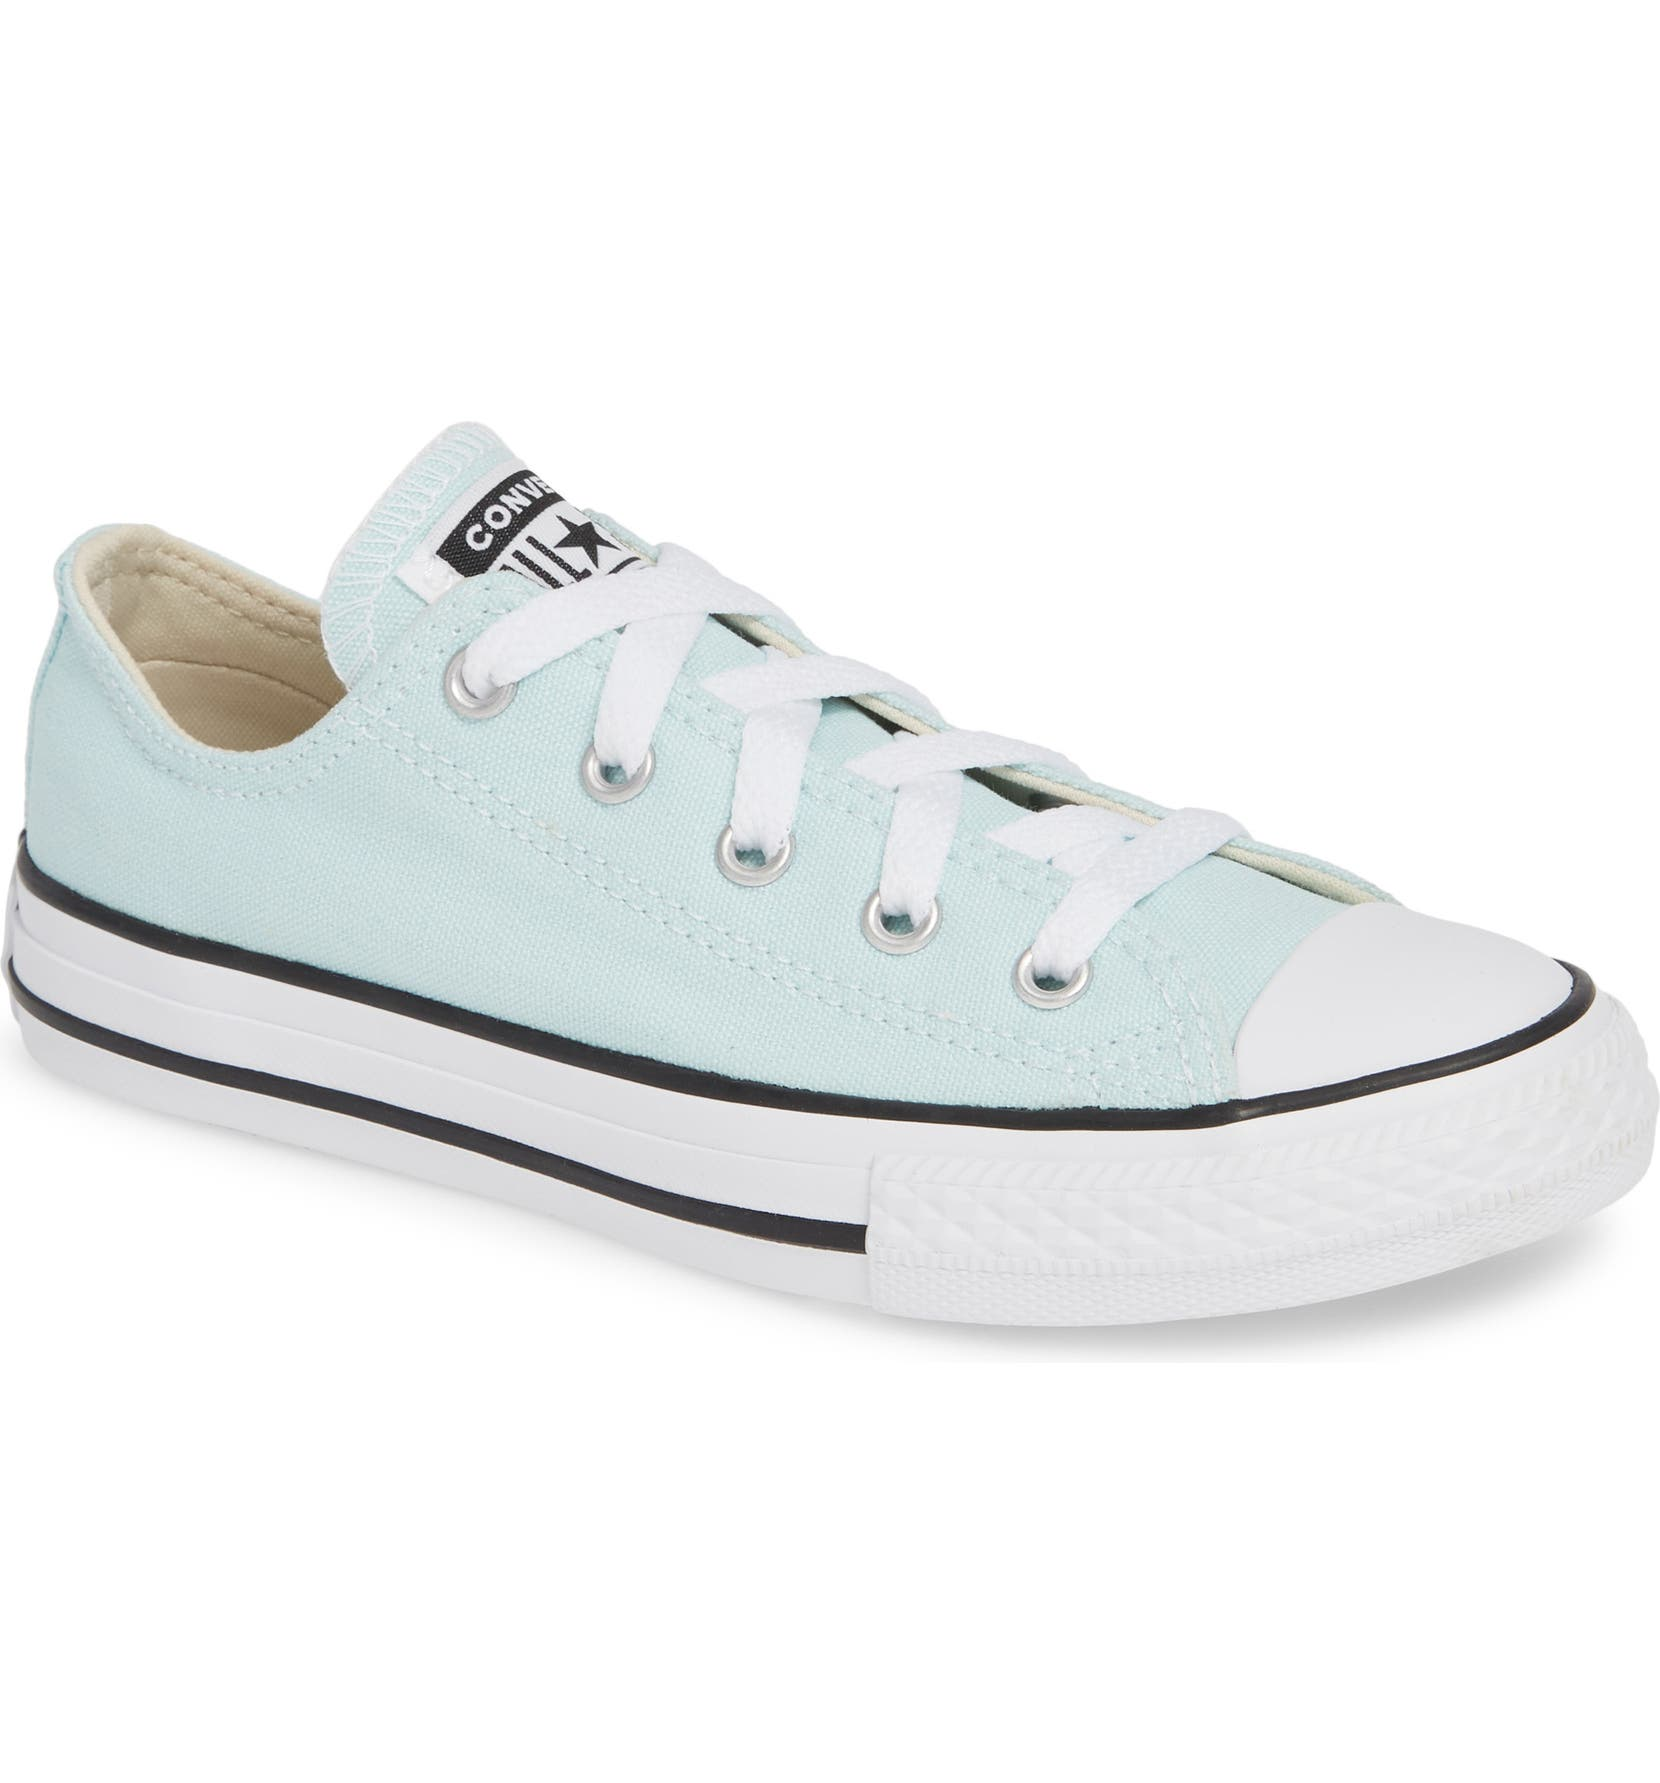 b8f8305bca68 Converse Chuck Taylor® Sneaker (Toddler